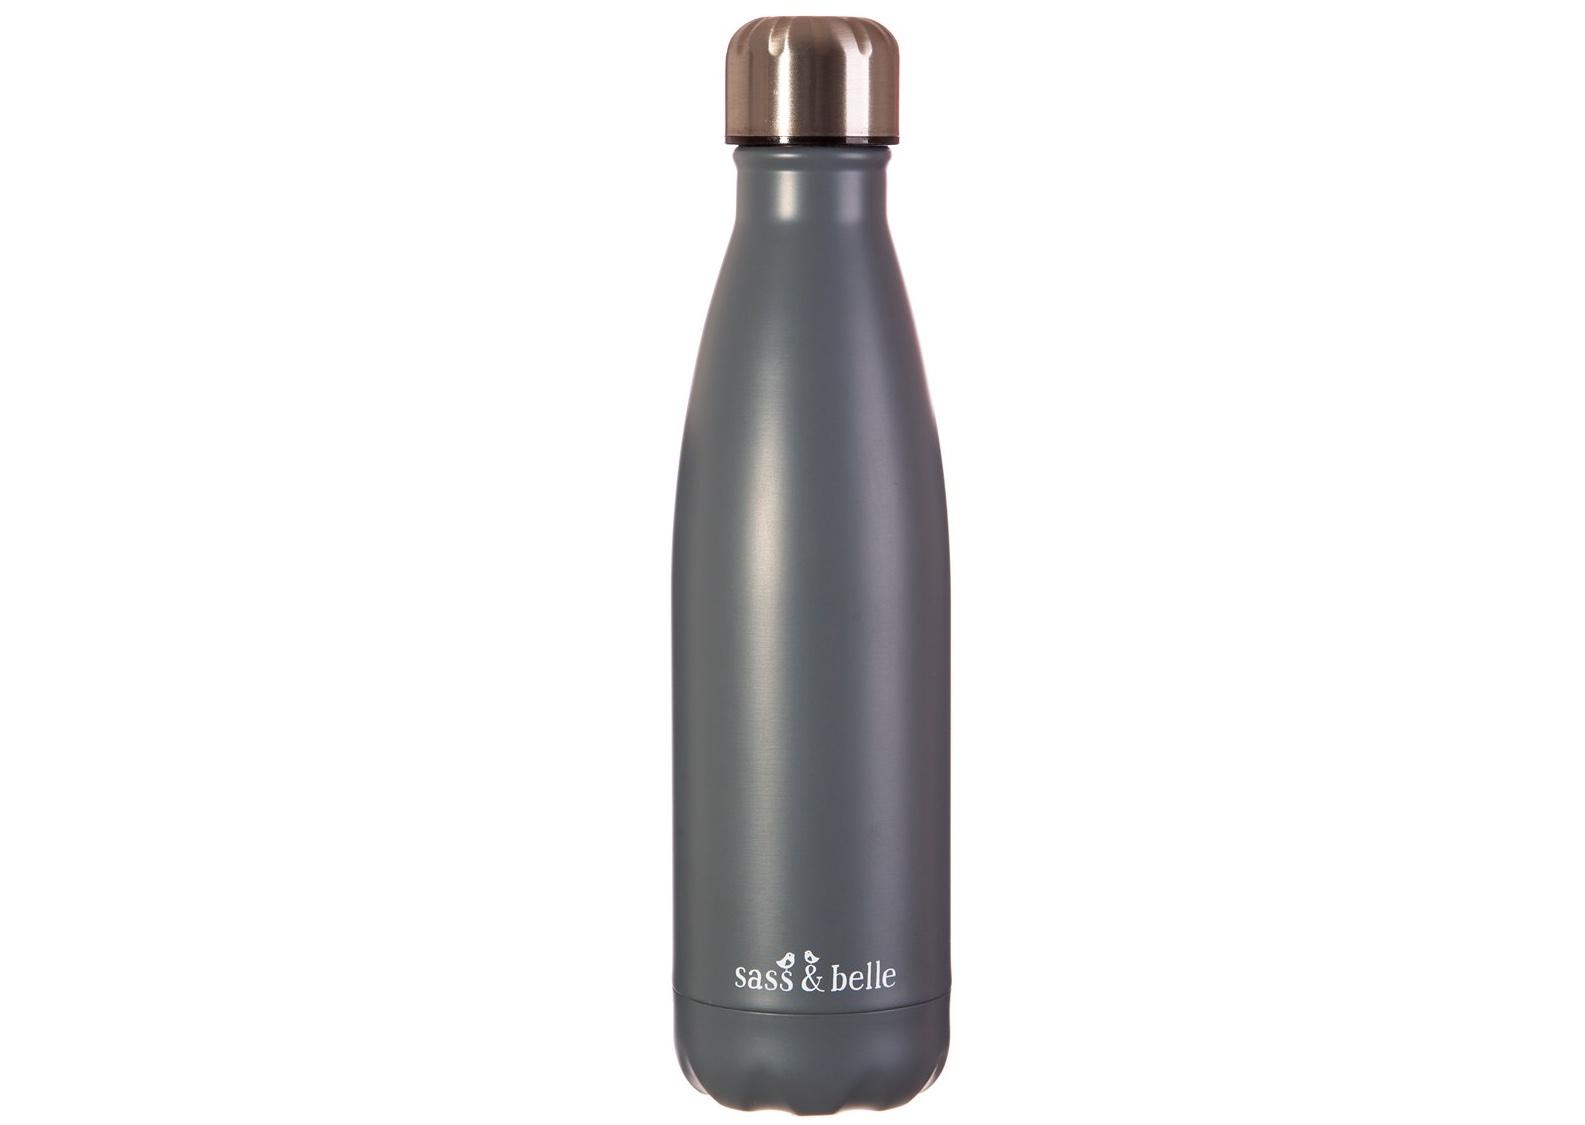 Grey Stainless Steel Drinks Bottle